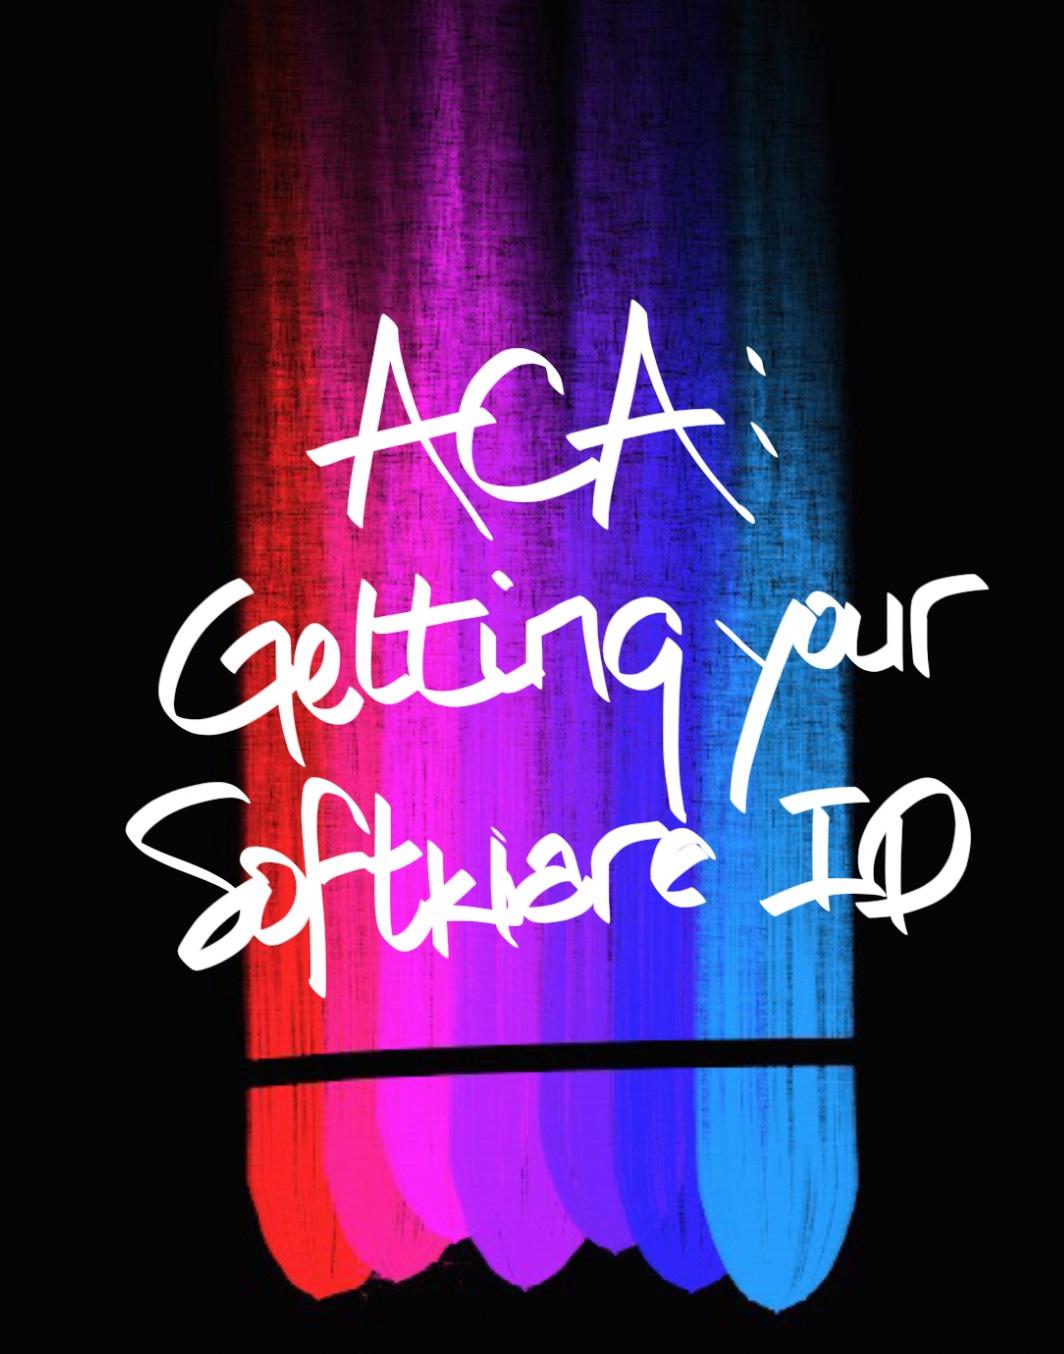 ACA - Software Id